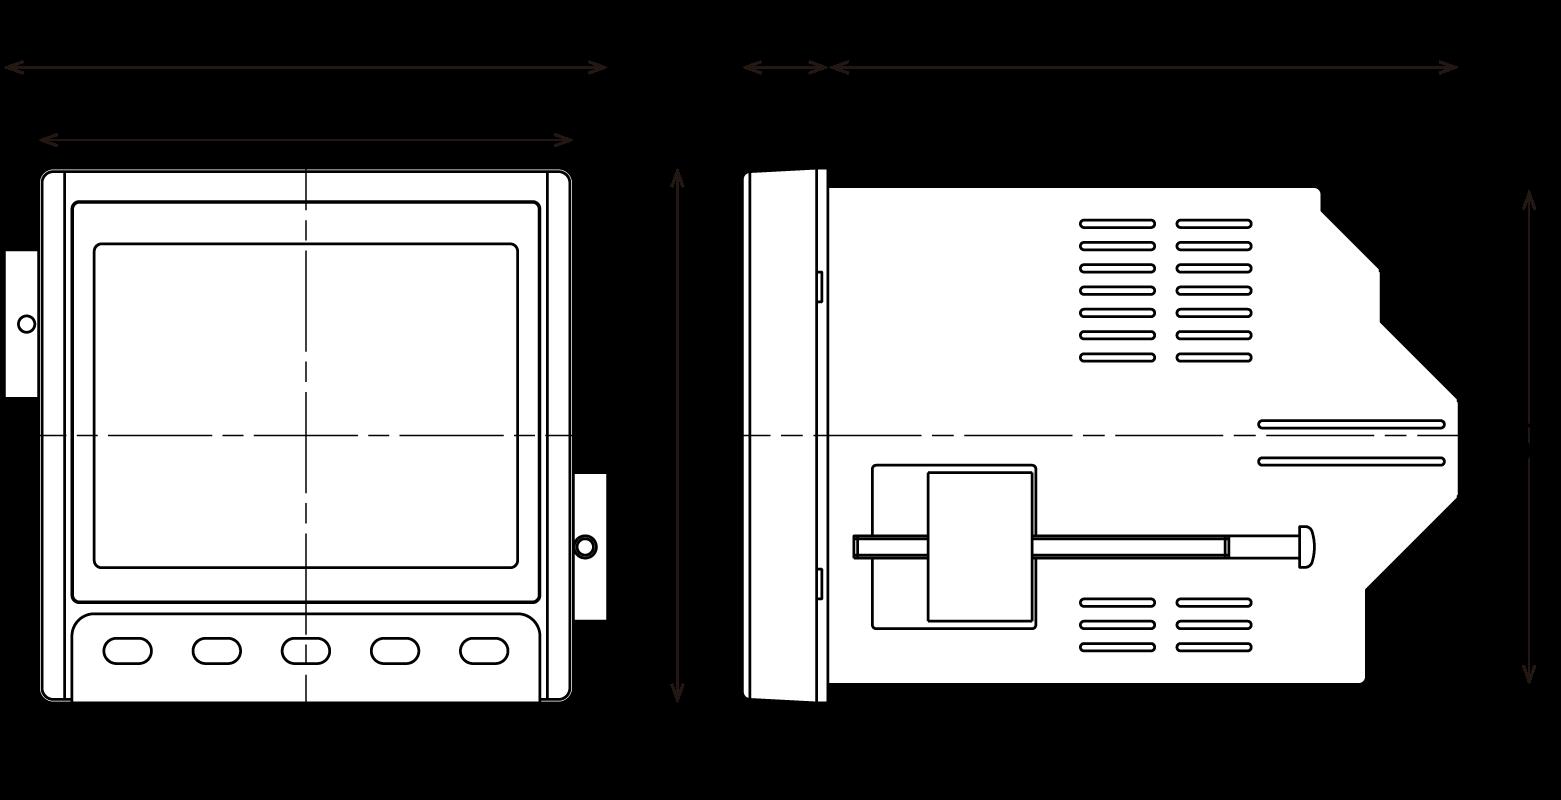 SQLC-72L Dimensions